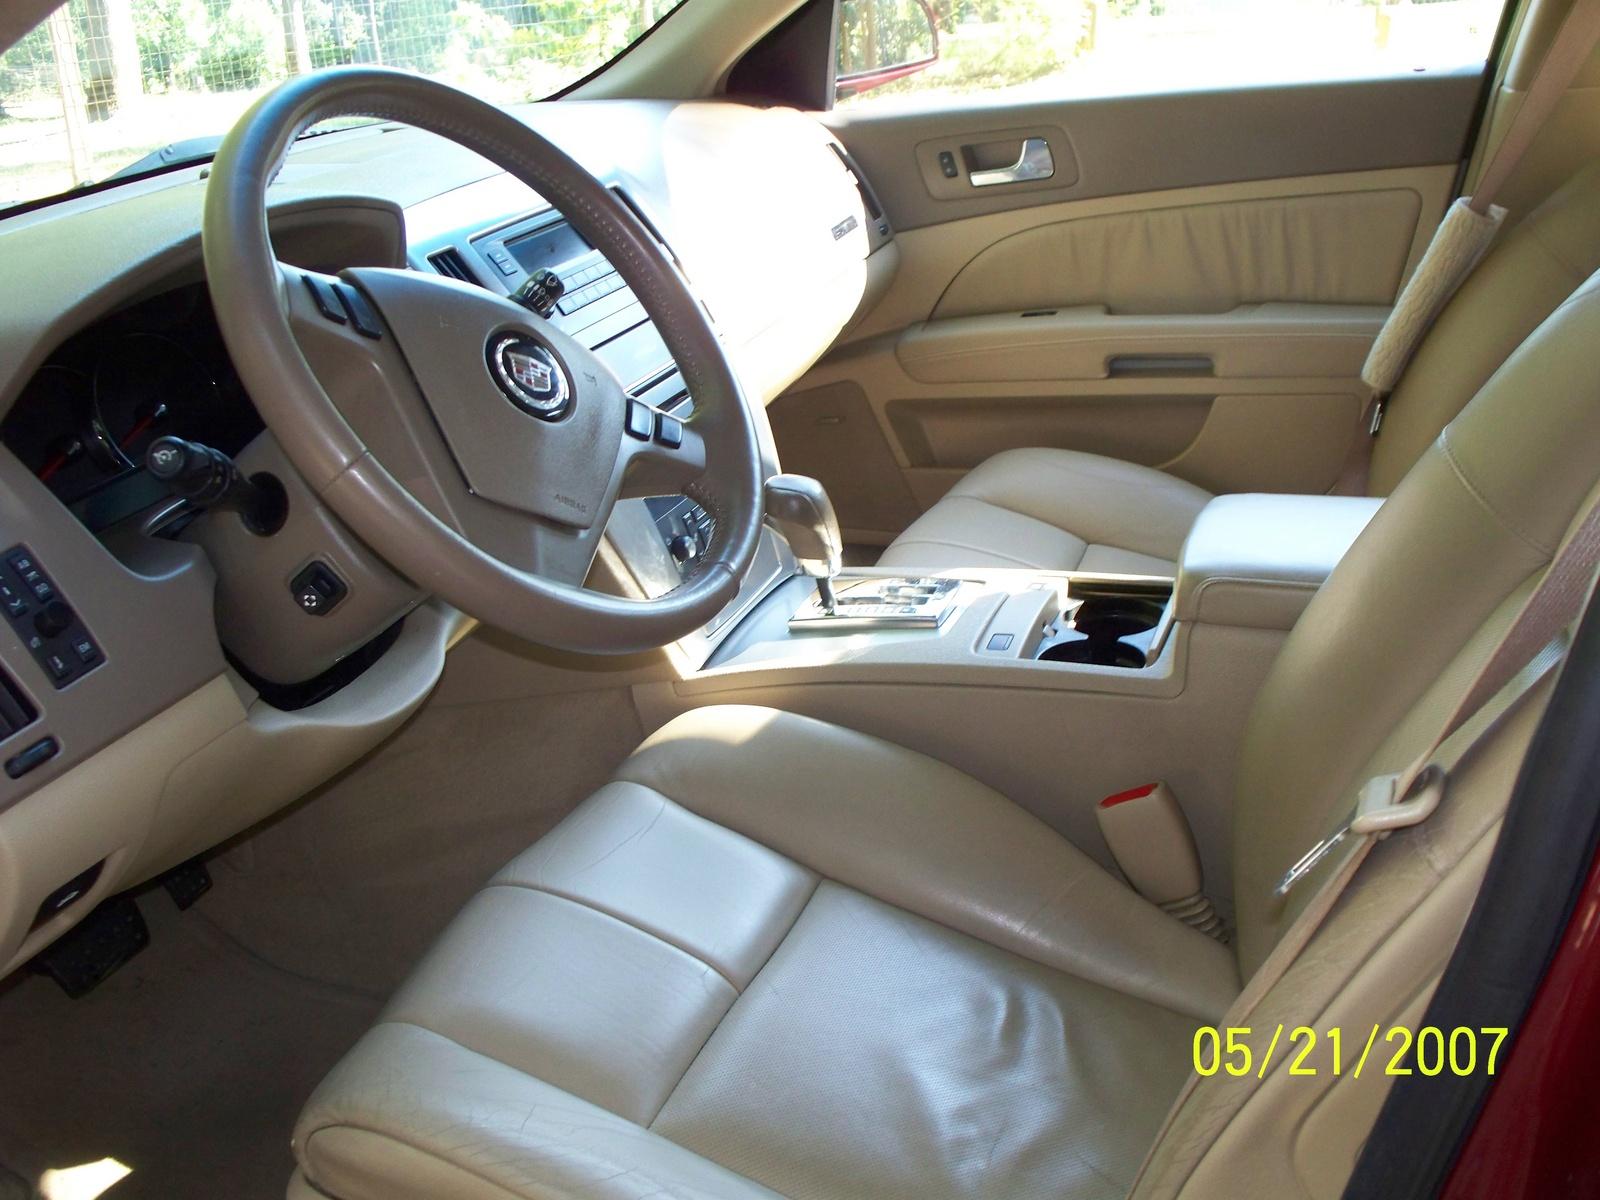 Black Cadillac Sts 2005 Inside